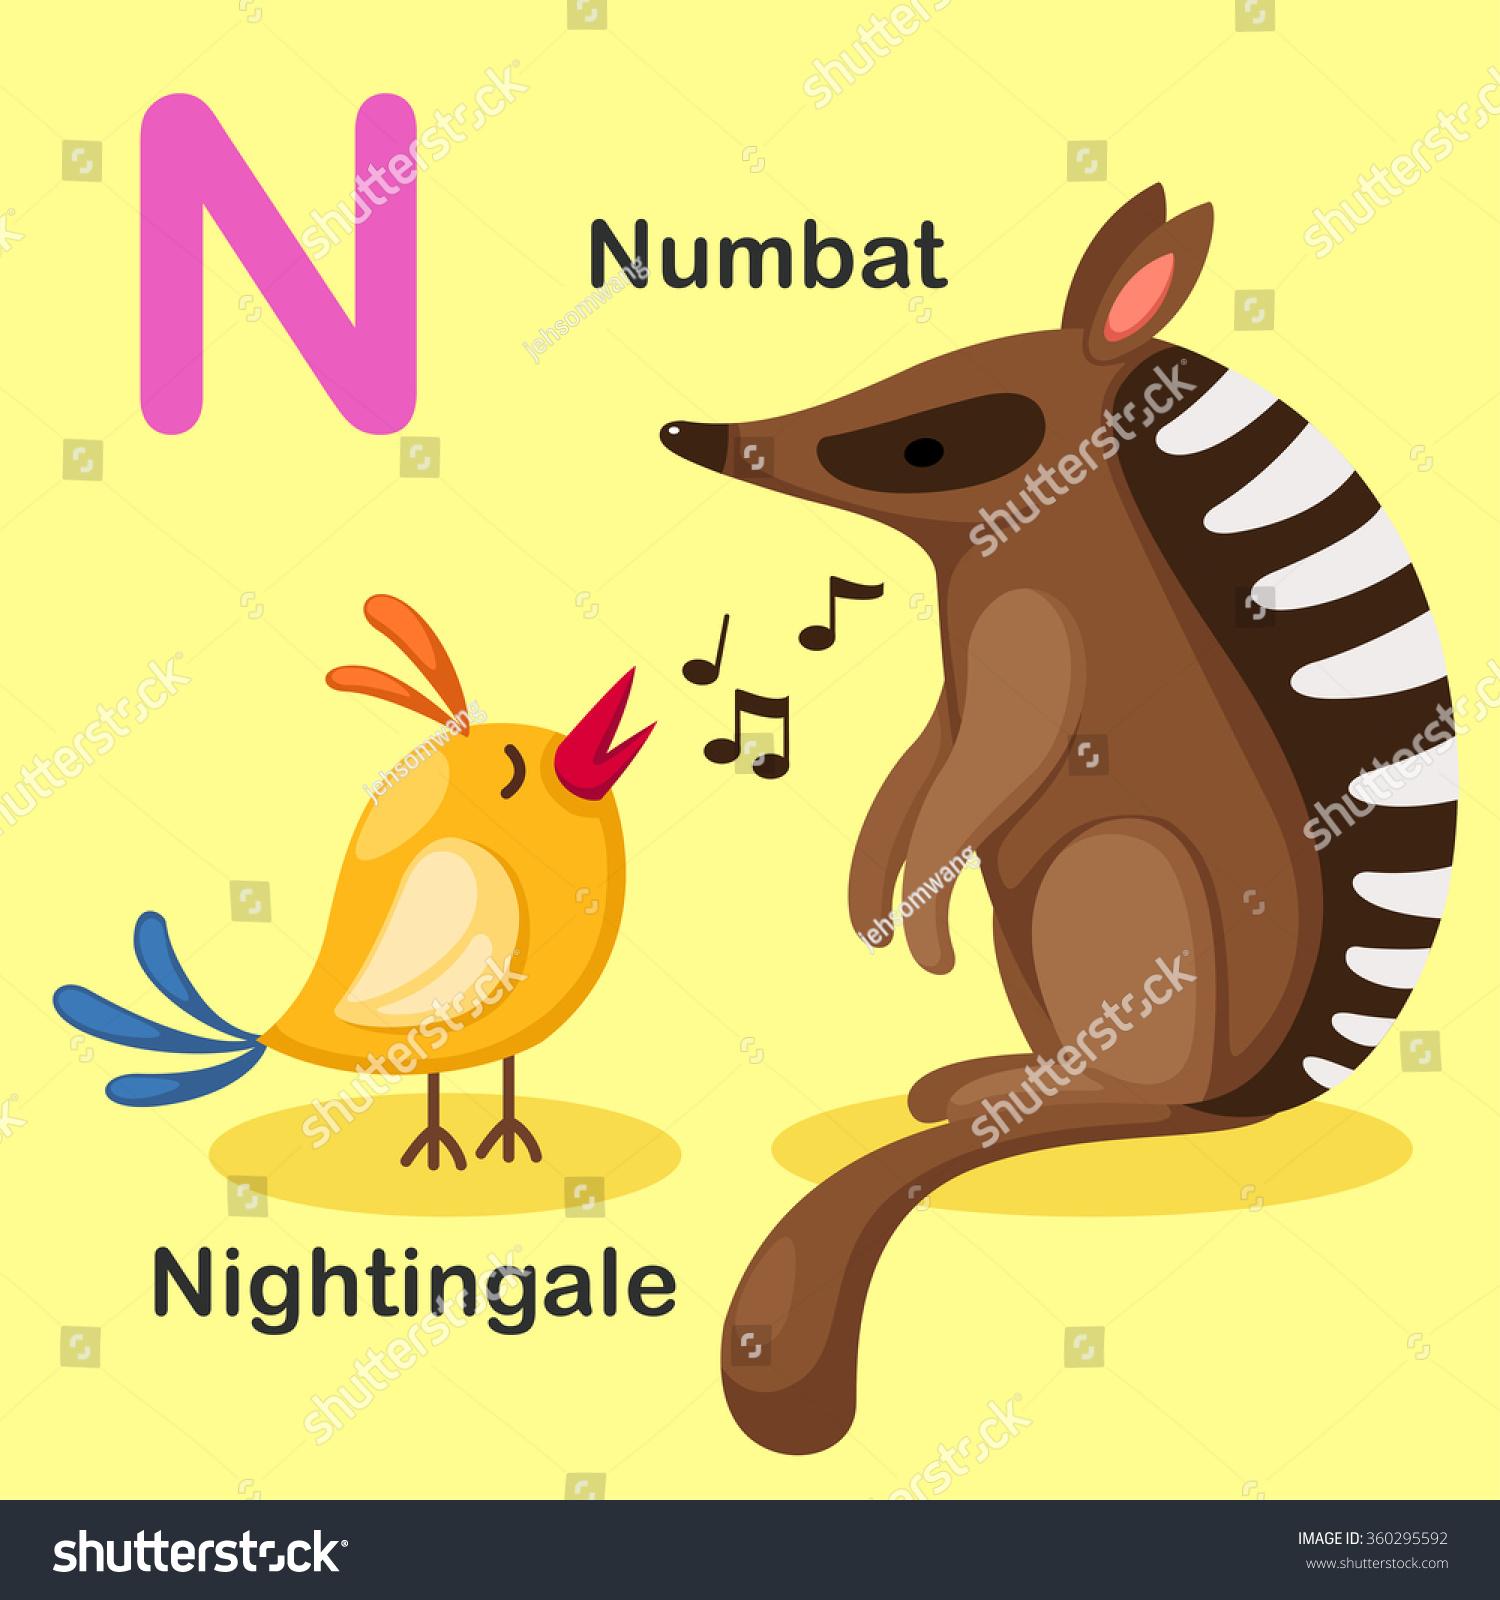 Illustration Isolated Animal Alphabet Letter Nnumbatnightingalevector Stock Vector